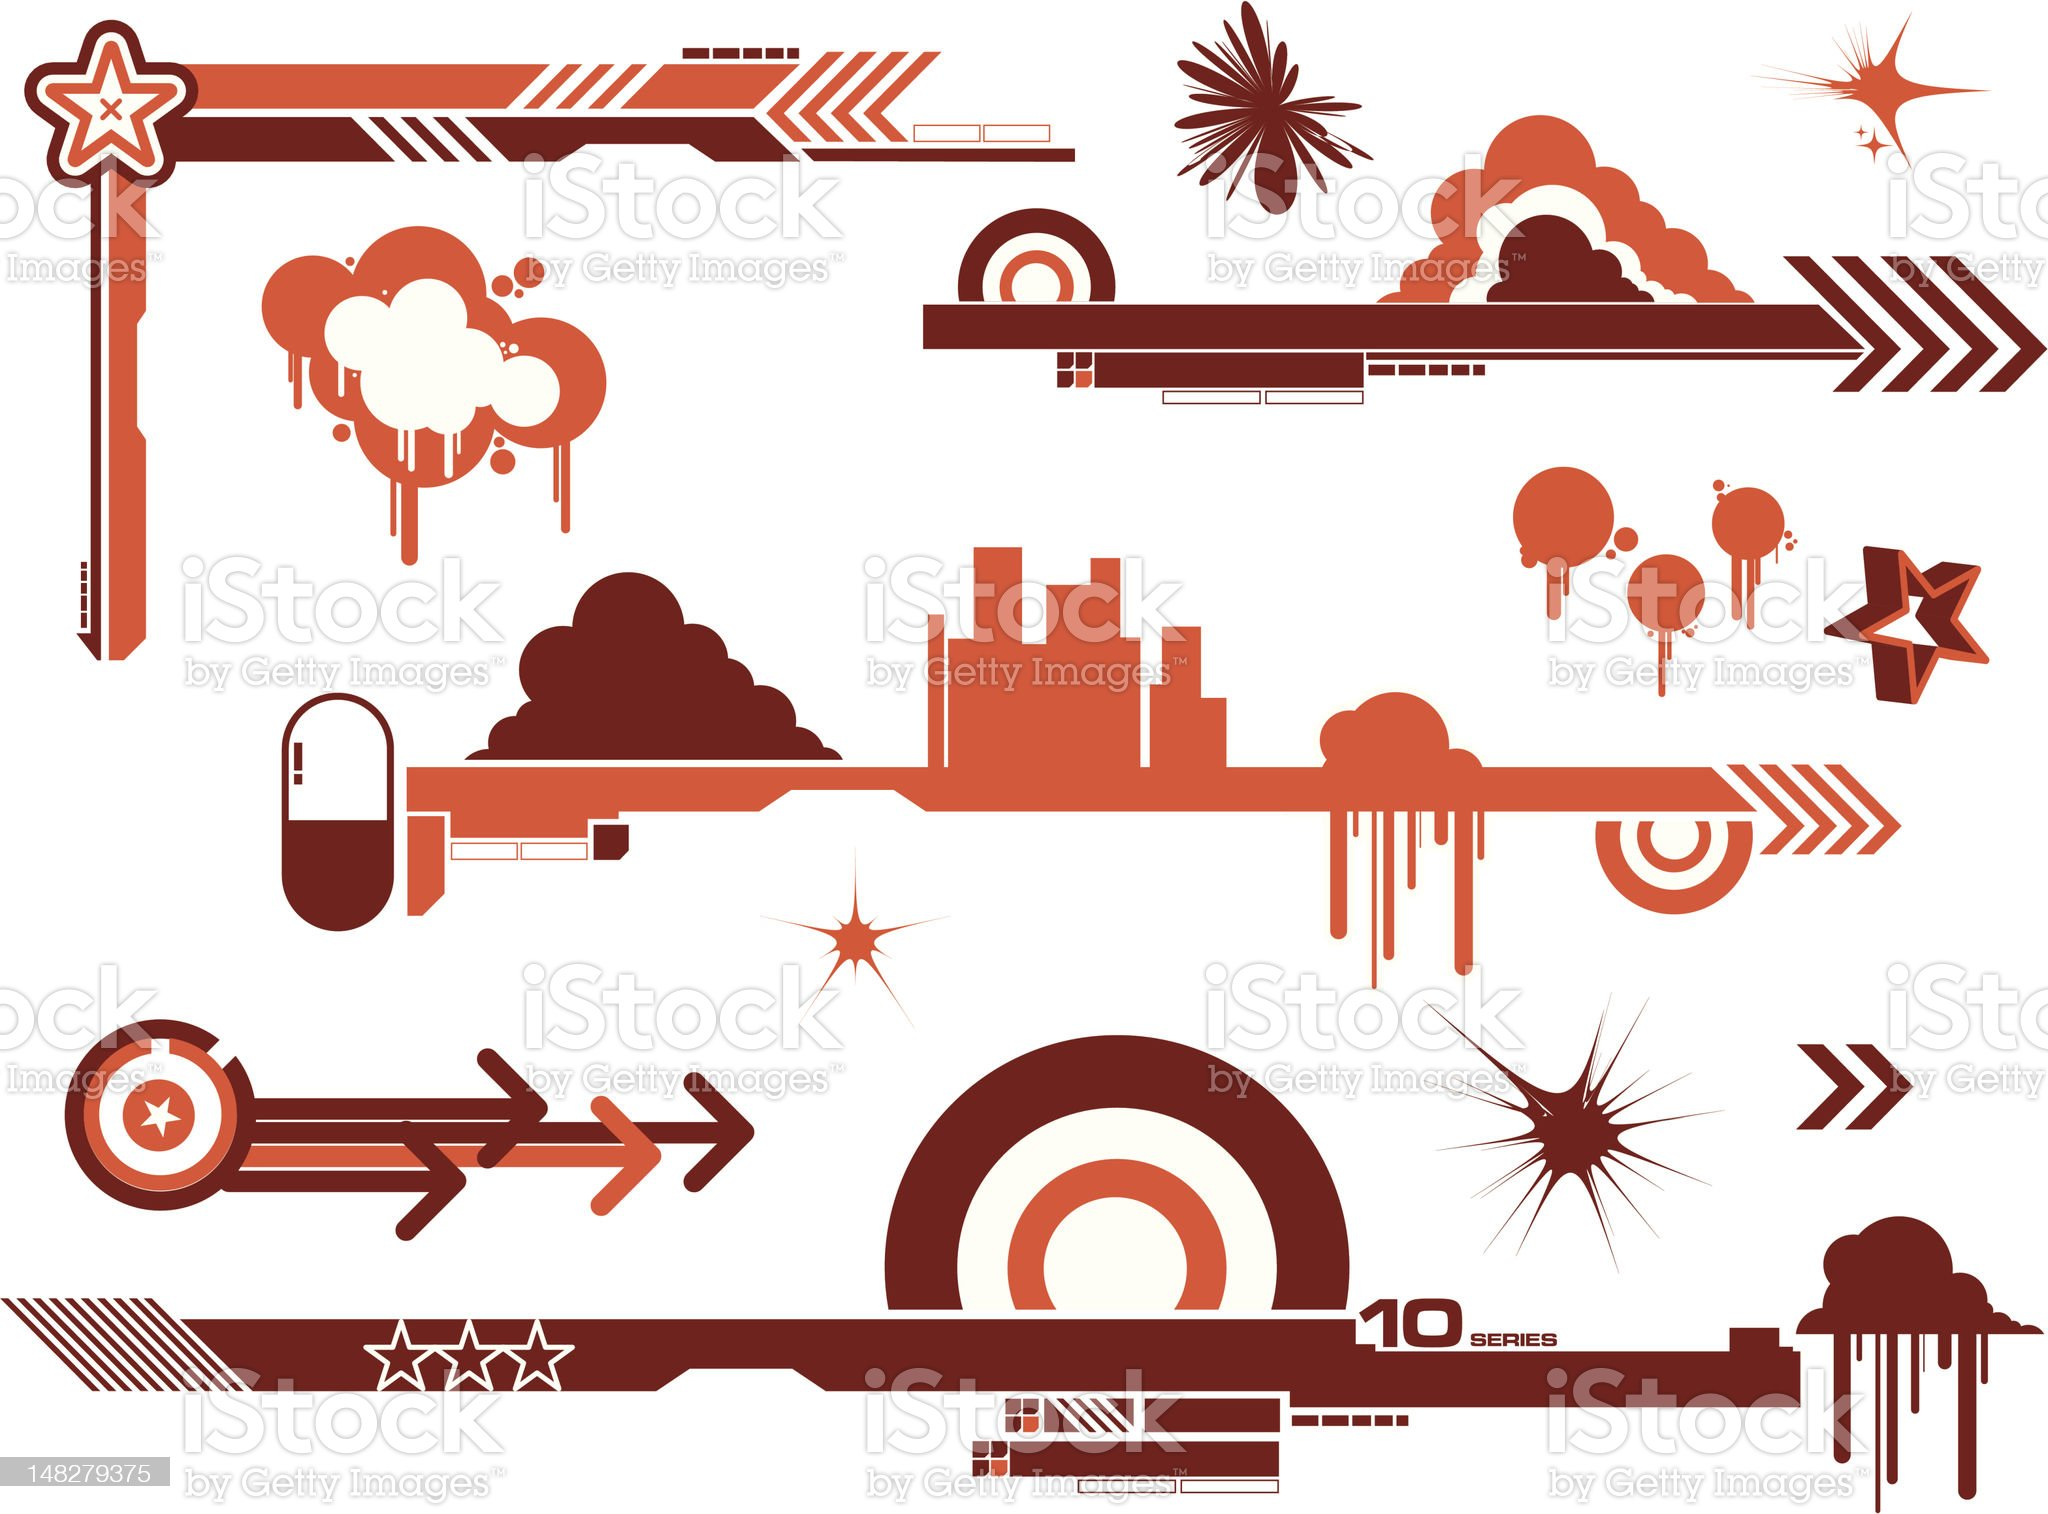 Design elements 002 royalty-free stock vector art